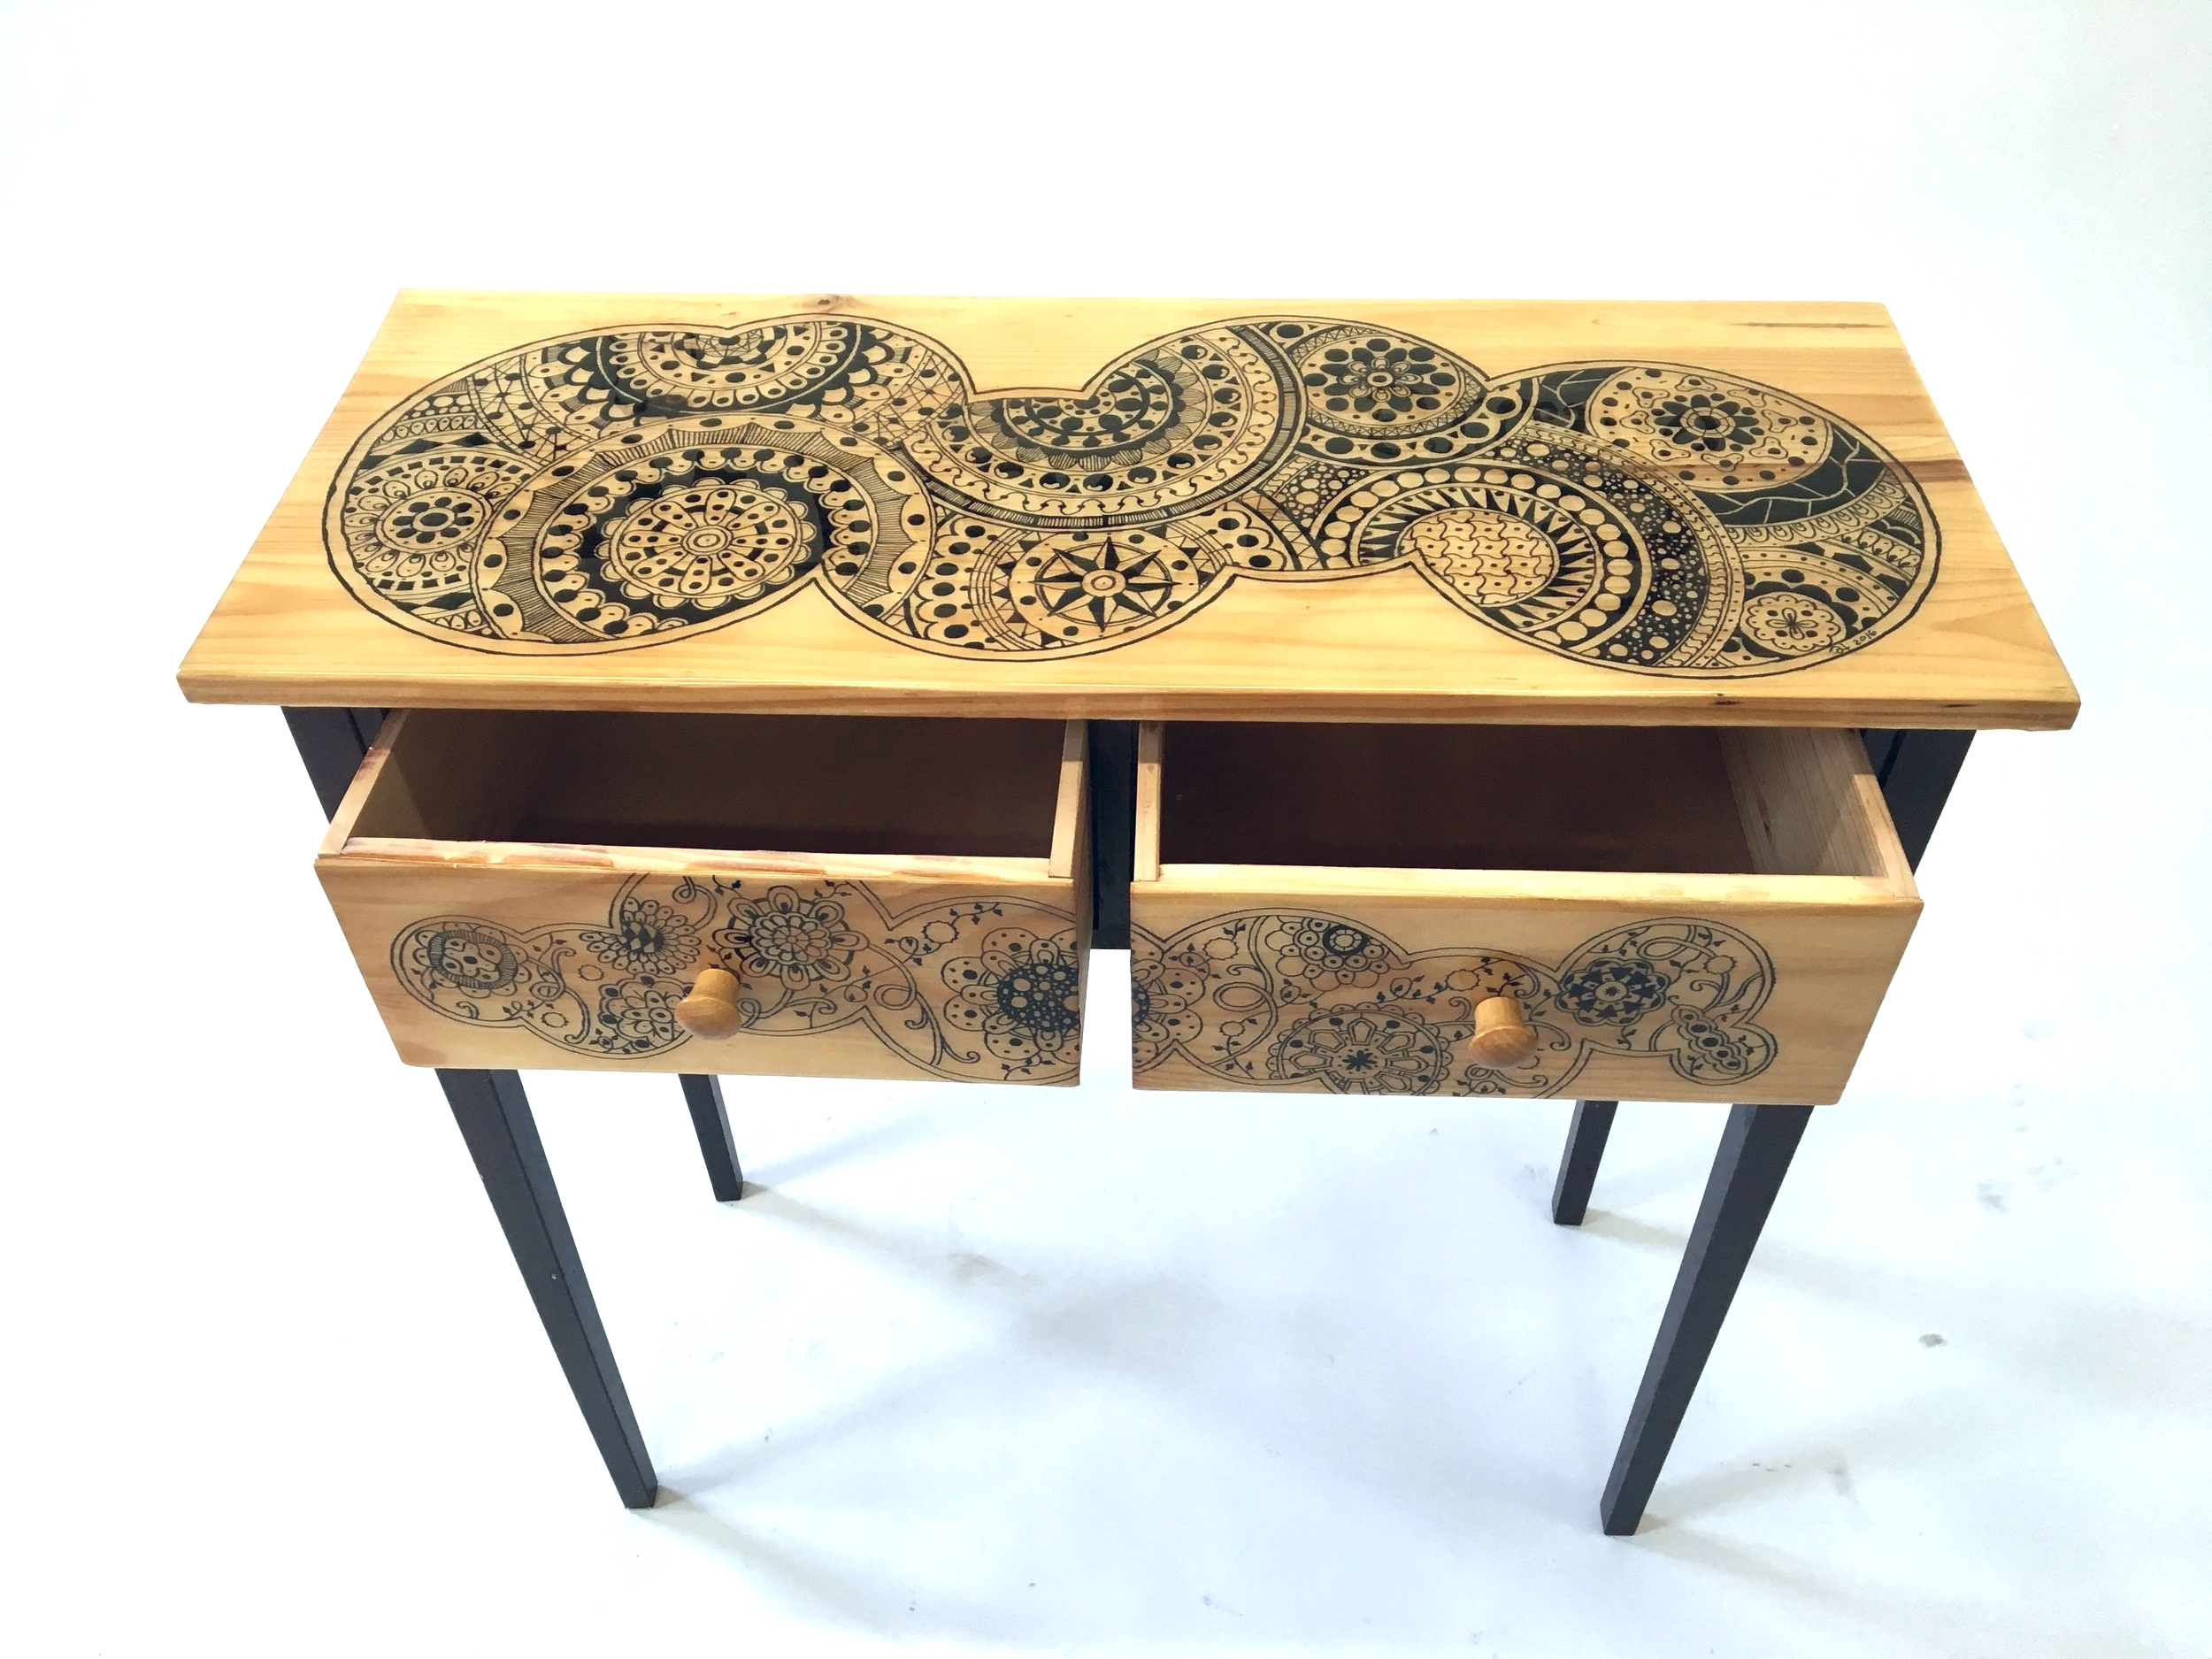 Hallway Table $350 (SOLD)